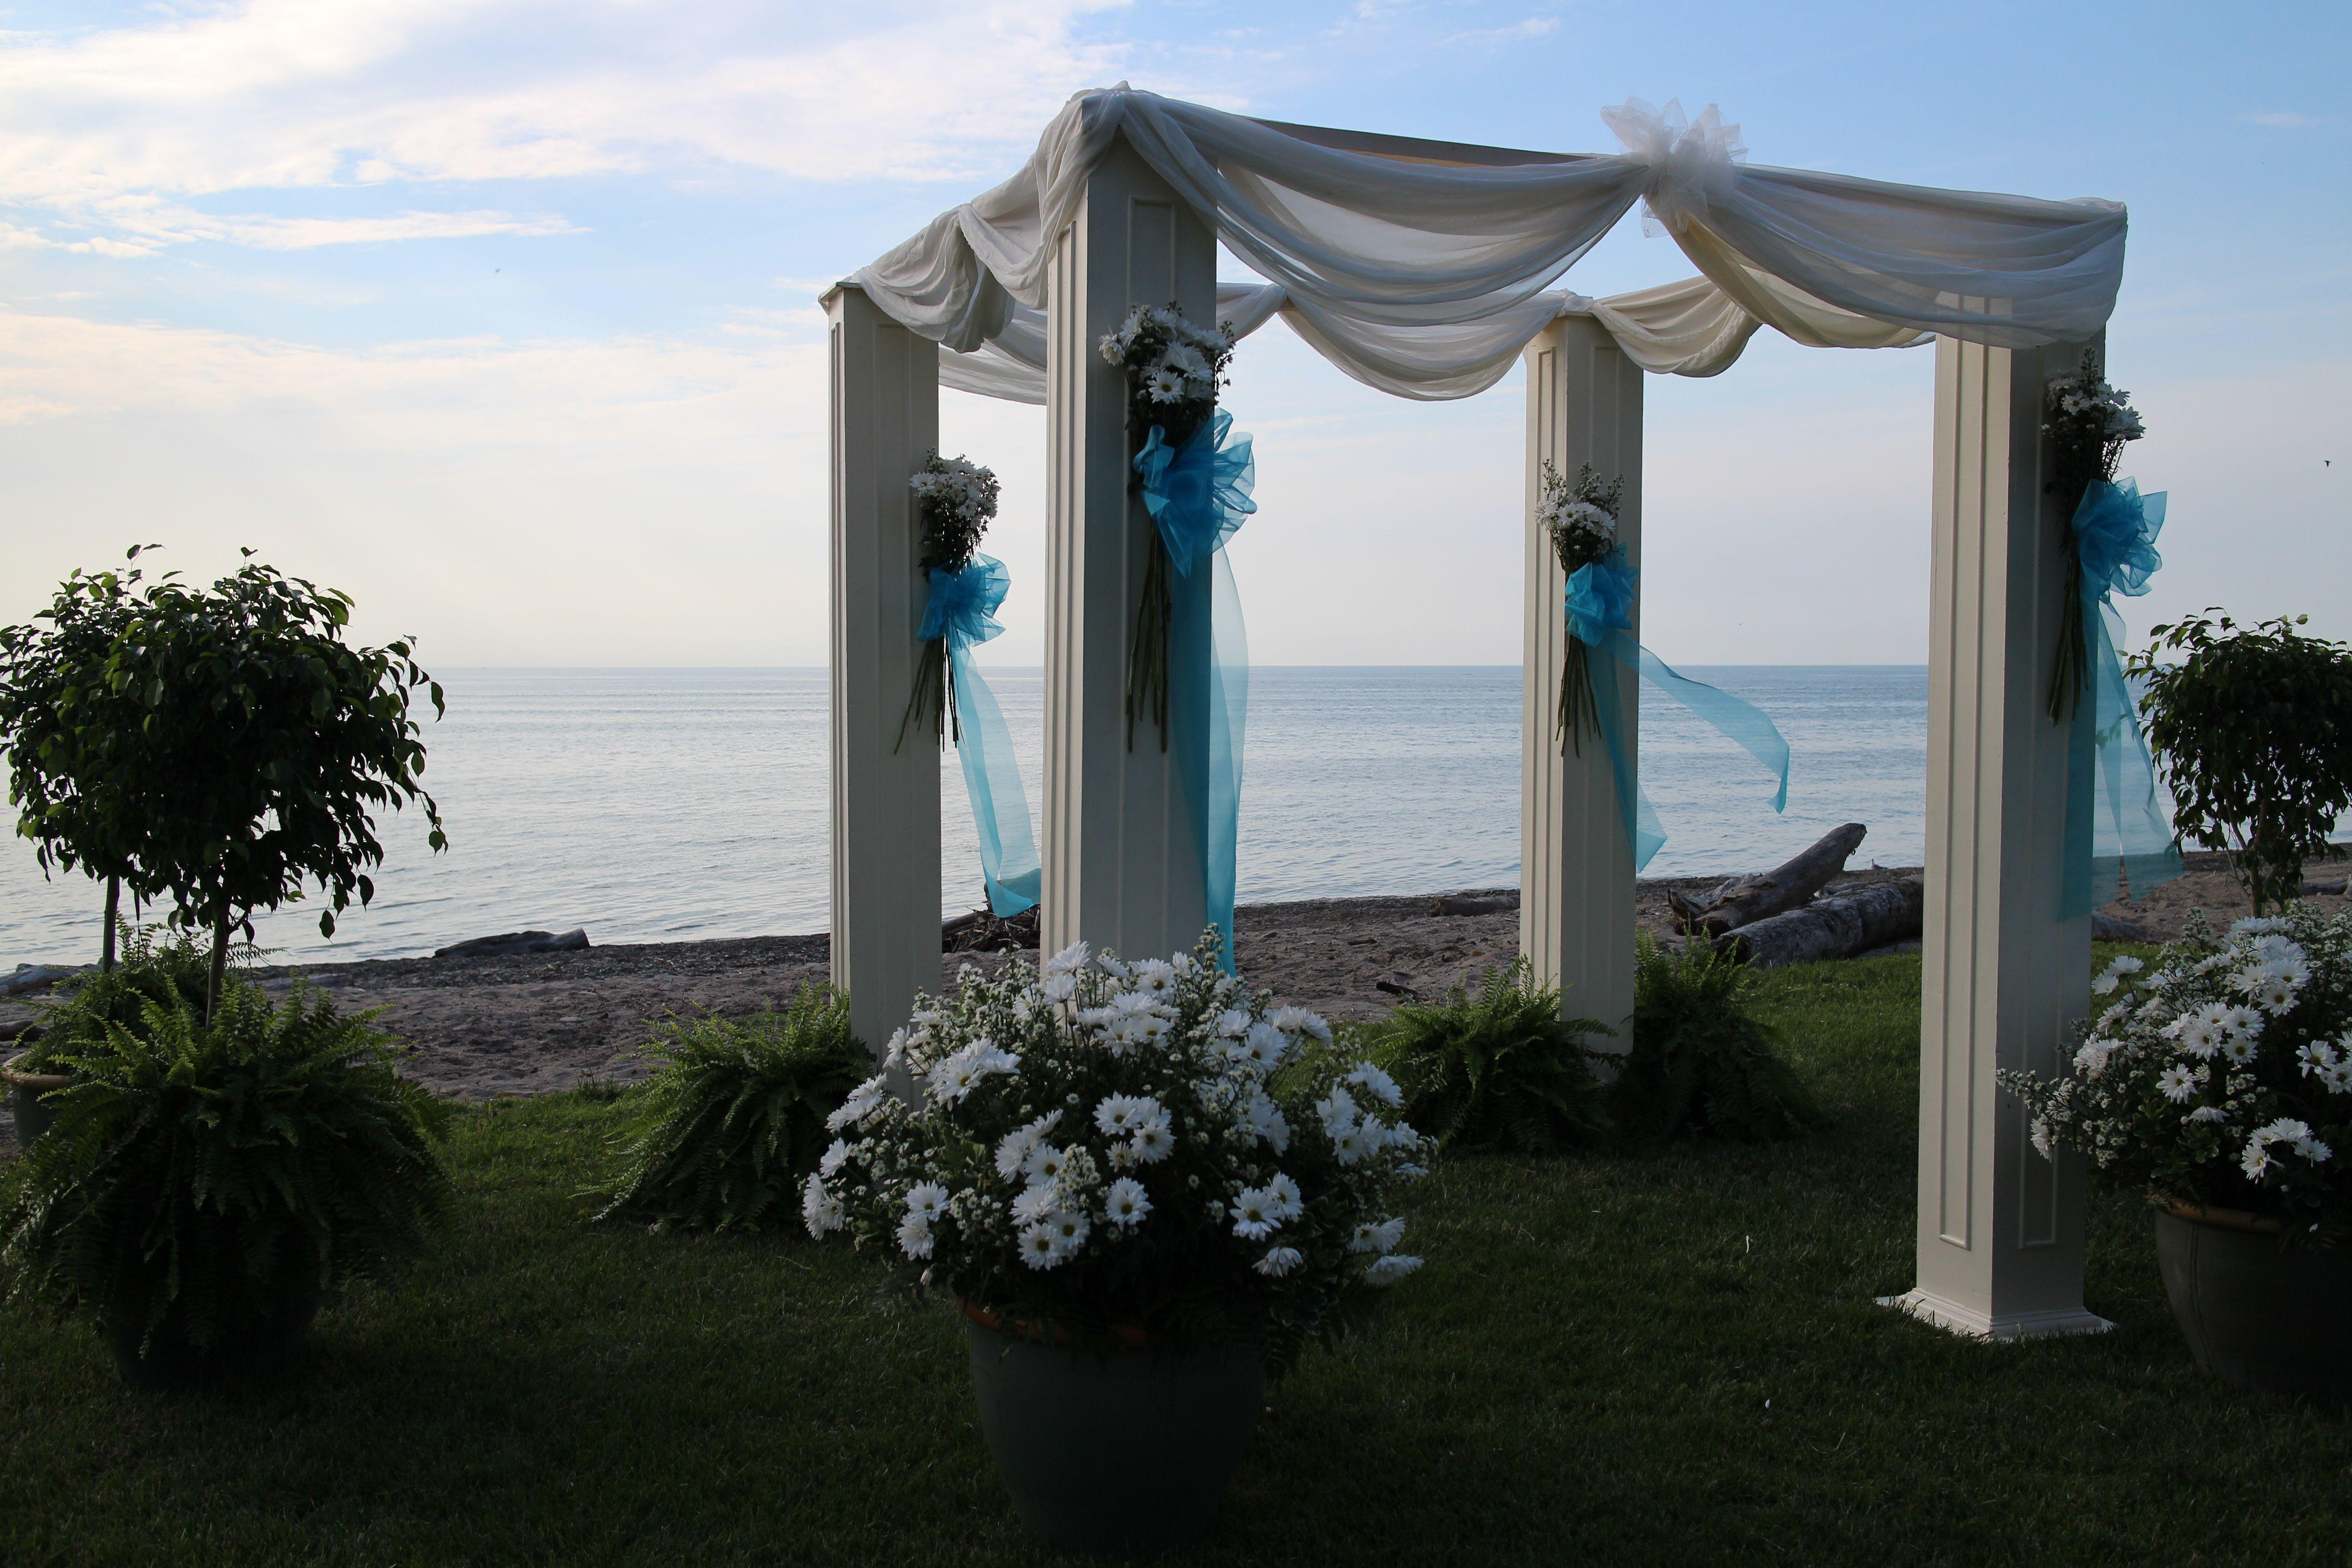 Beach wedding arbor wedding ideas pinterest beach wedding do it yourself wedding arbor bing images solutioingenieria Images